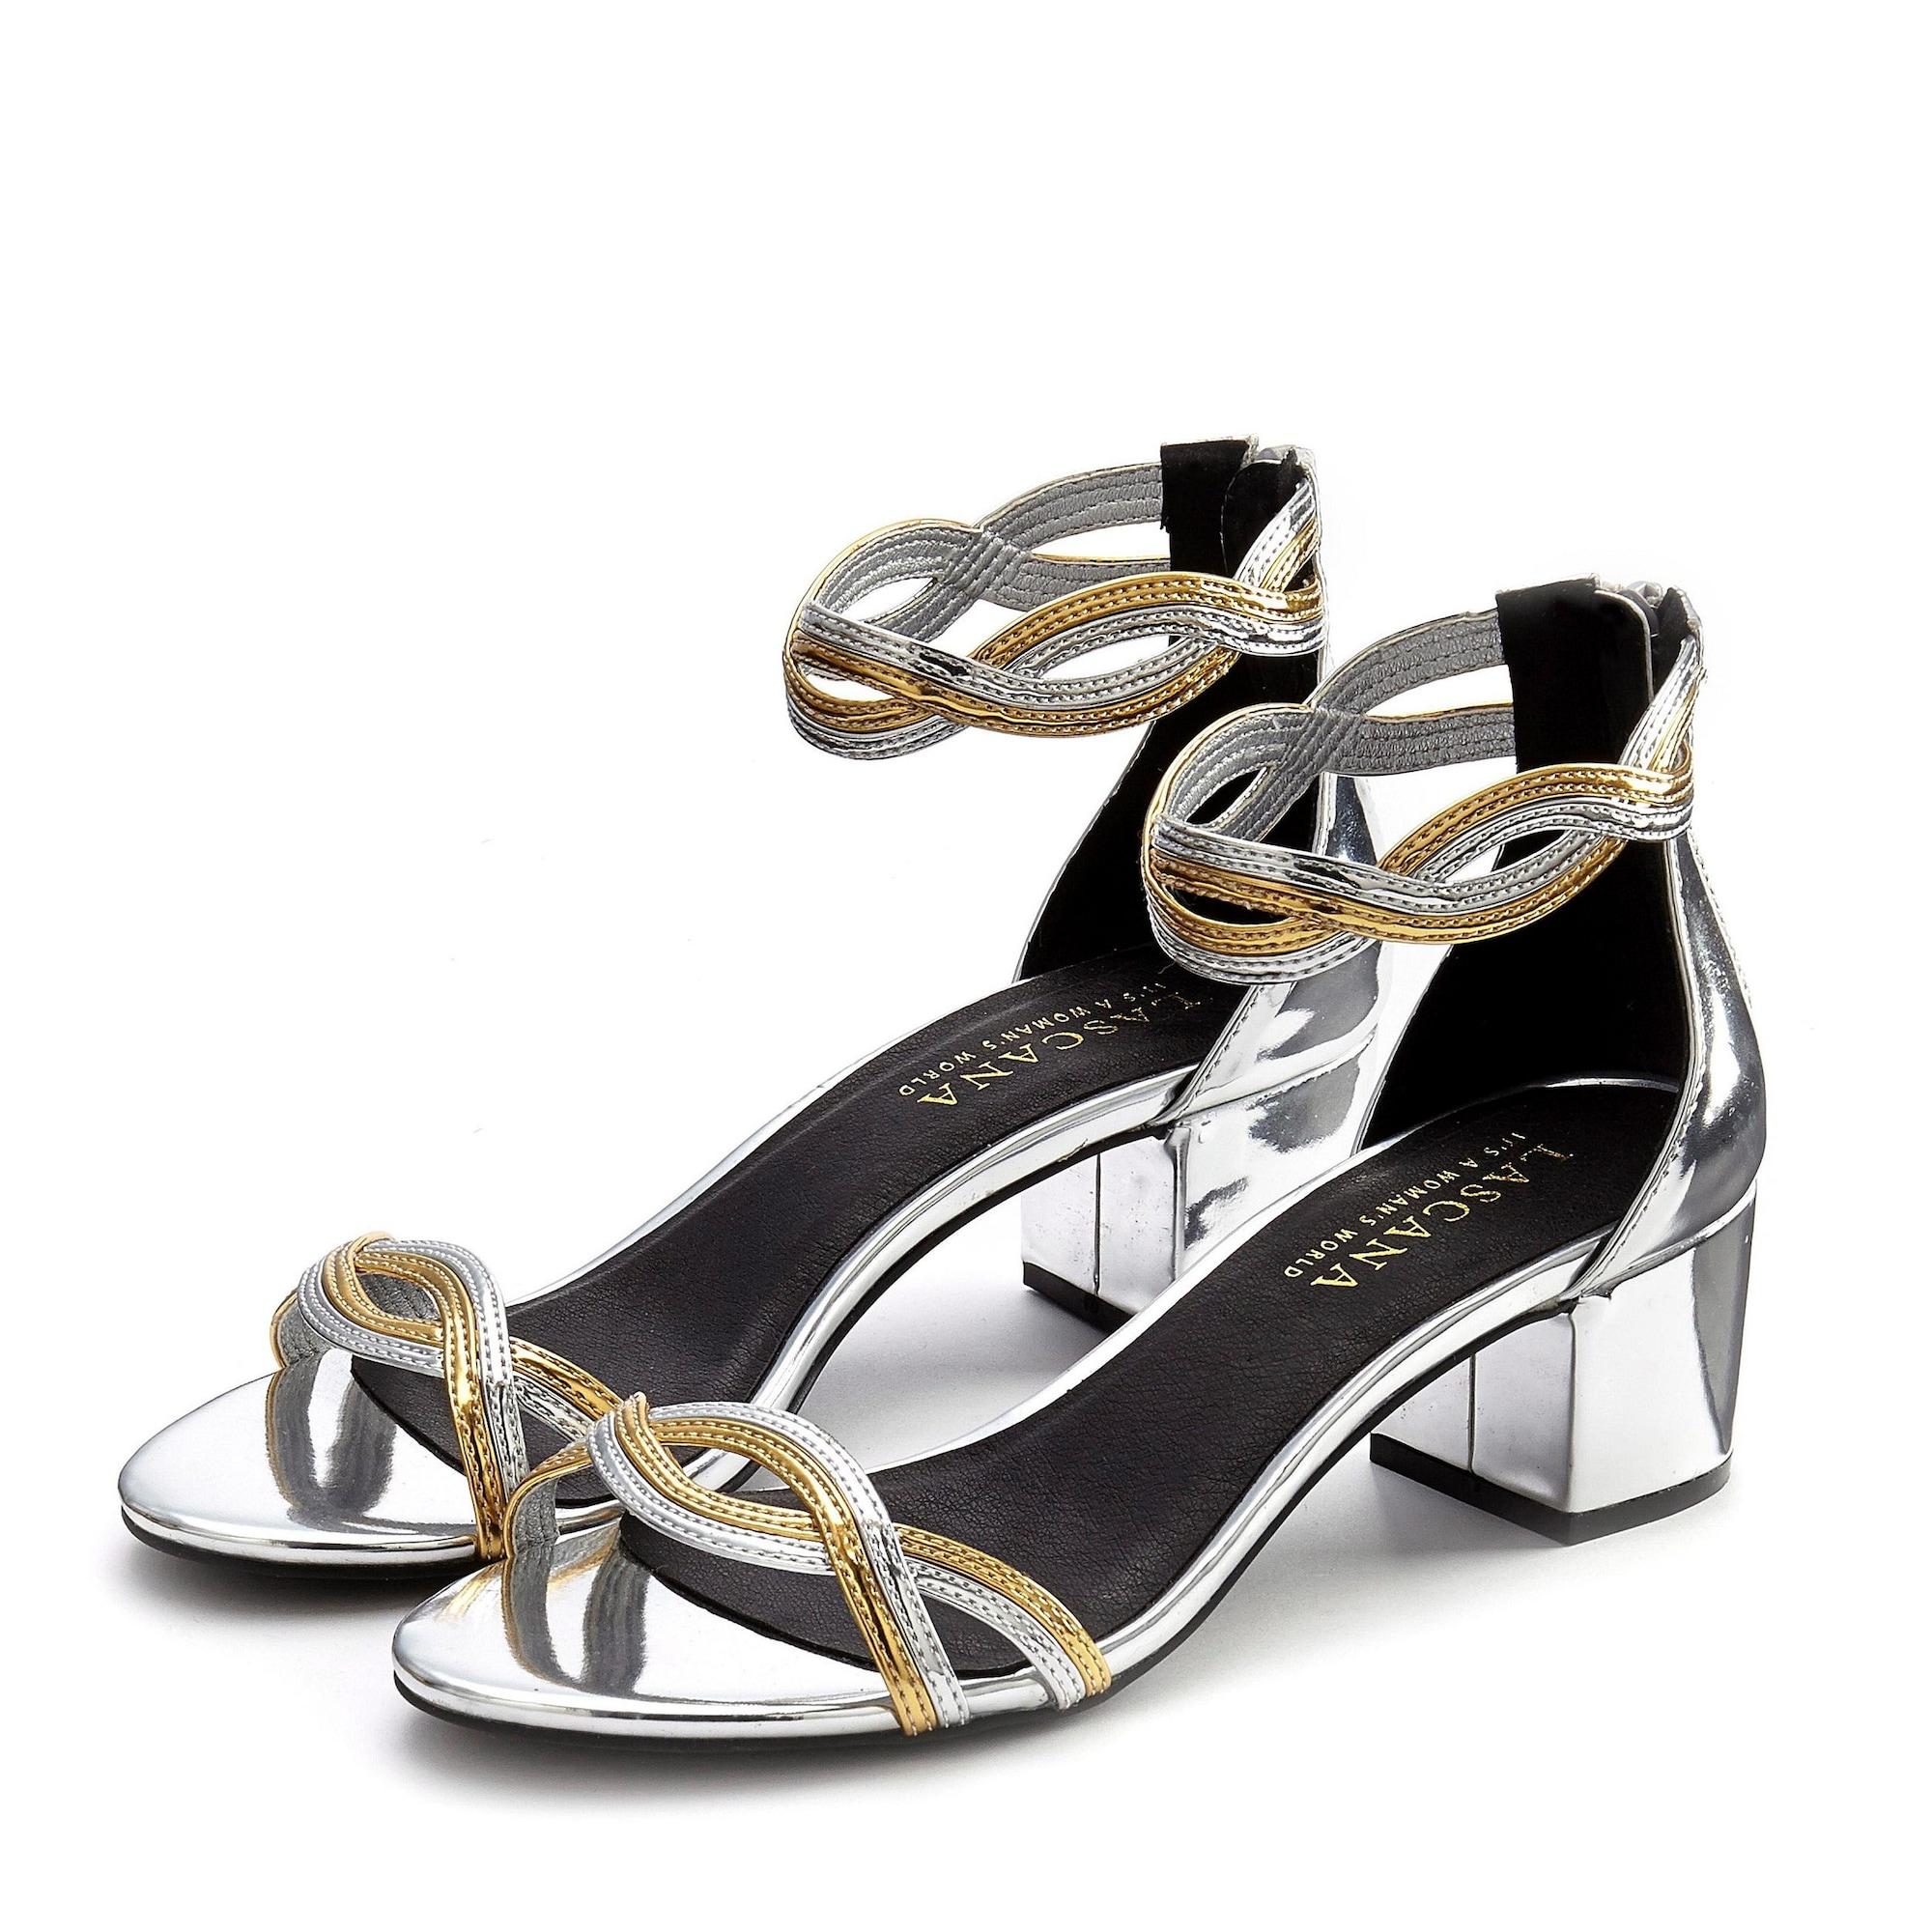 LASCANA Sandále  zlatá / strieborná